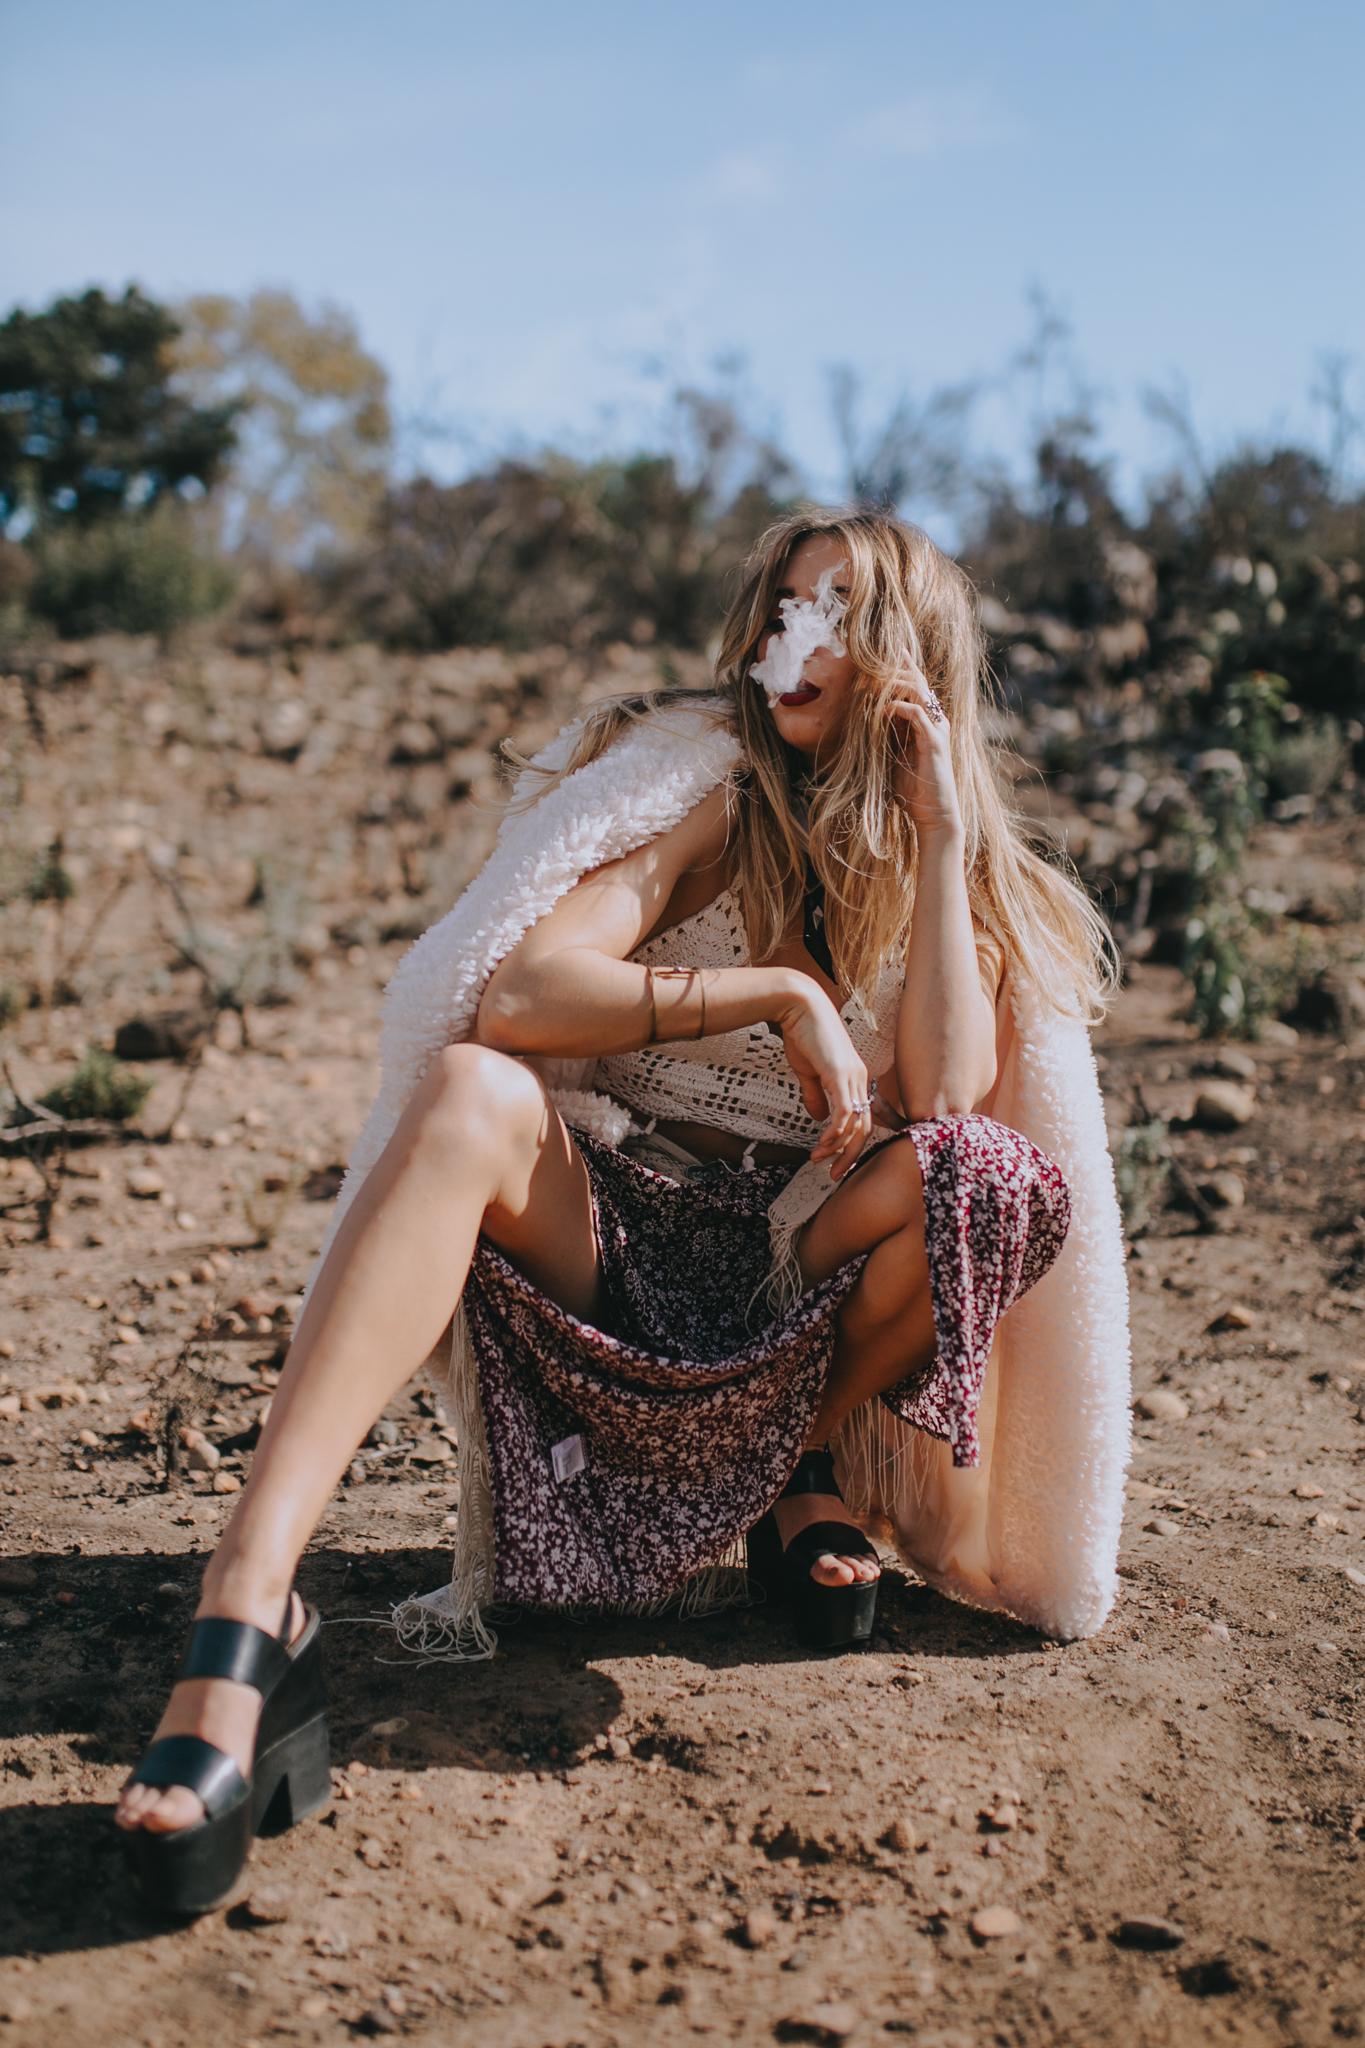 Lindsey-5387.jpg